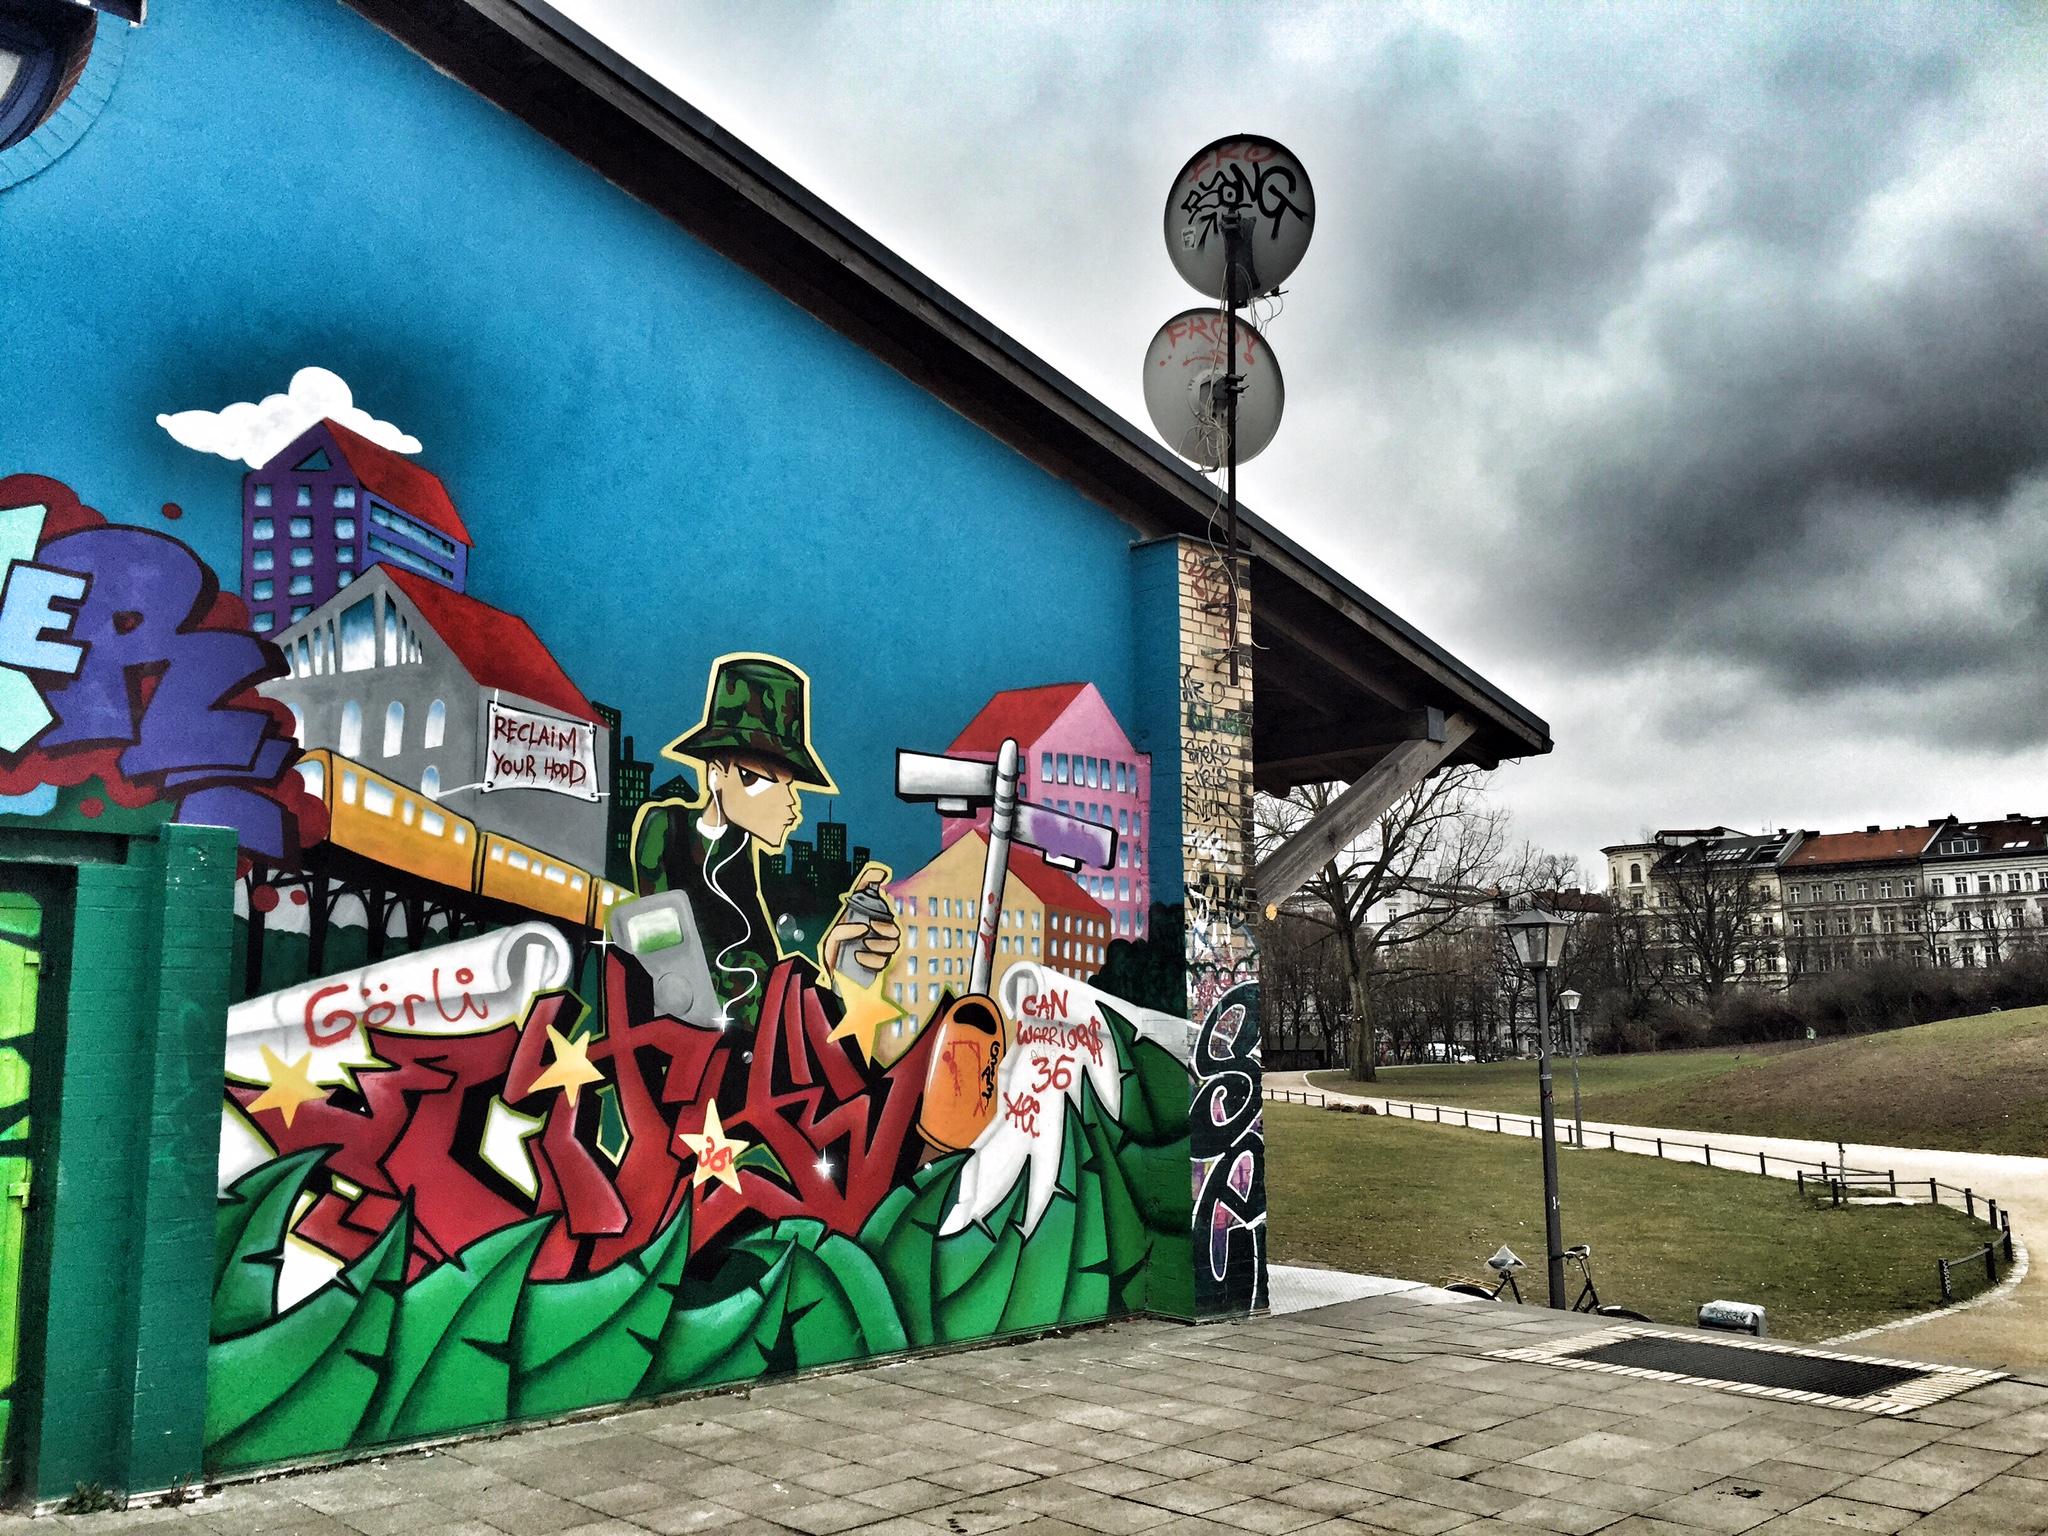 Berlin does graffiti really well